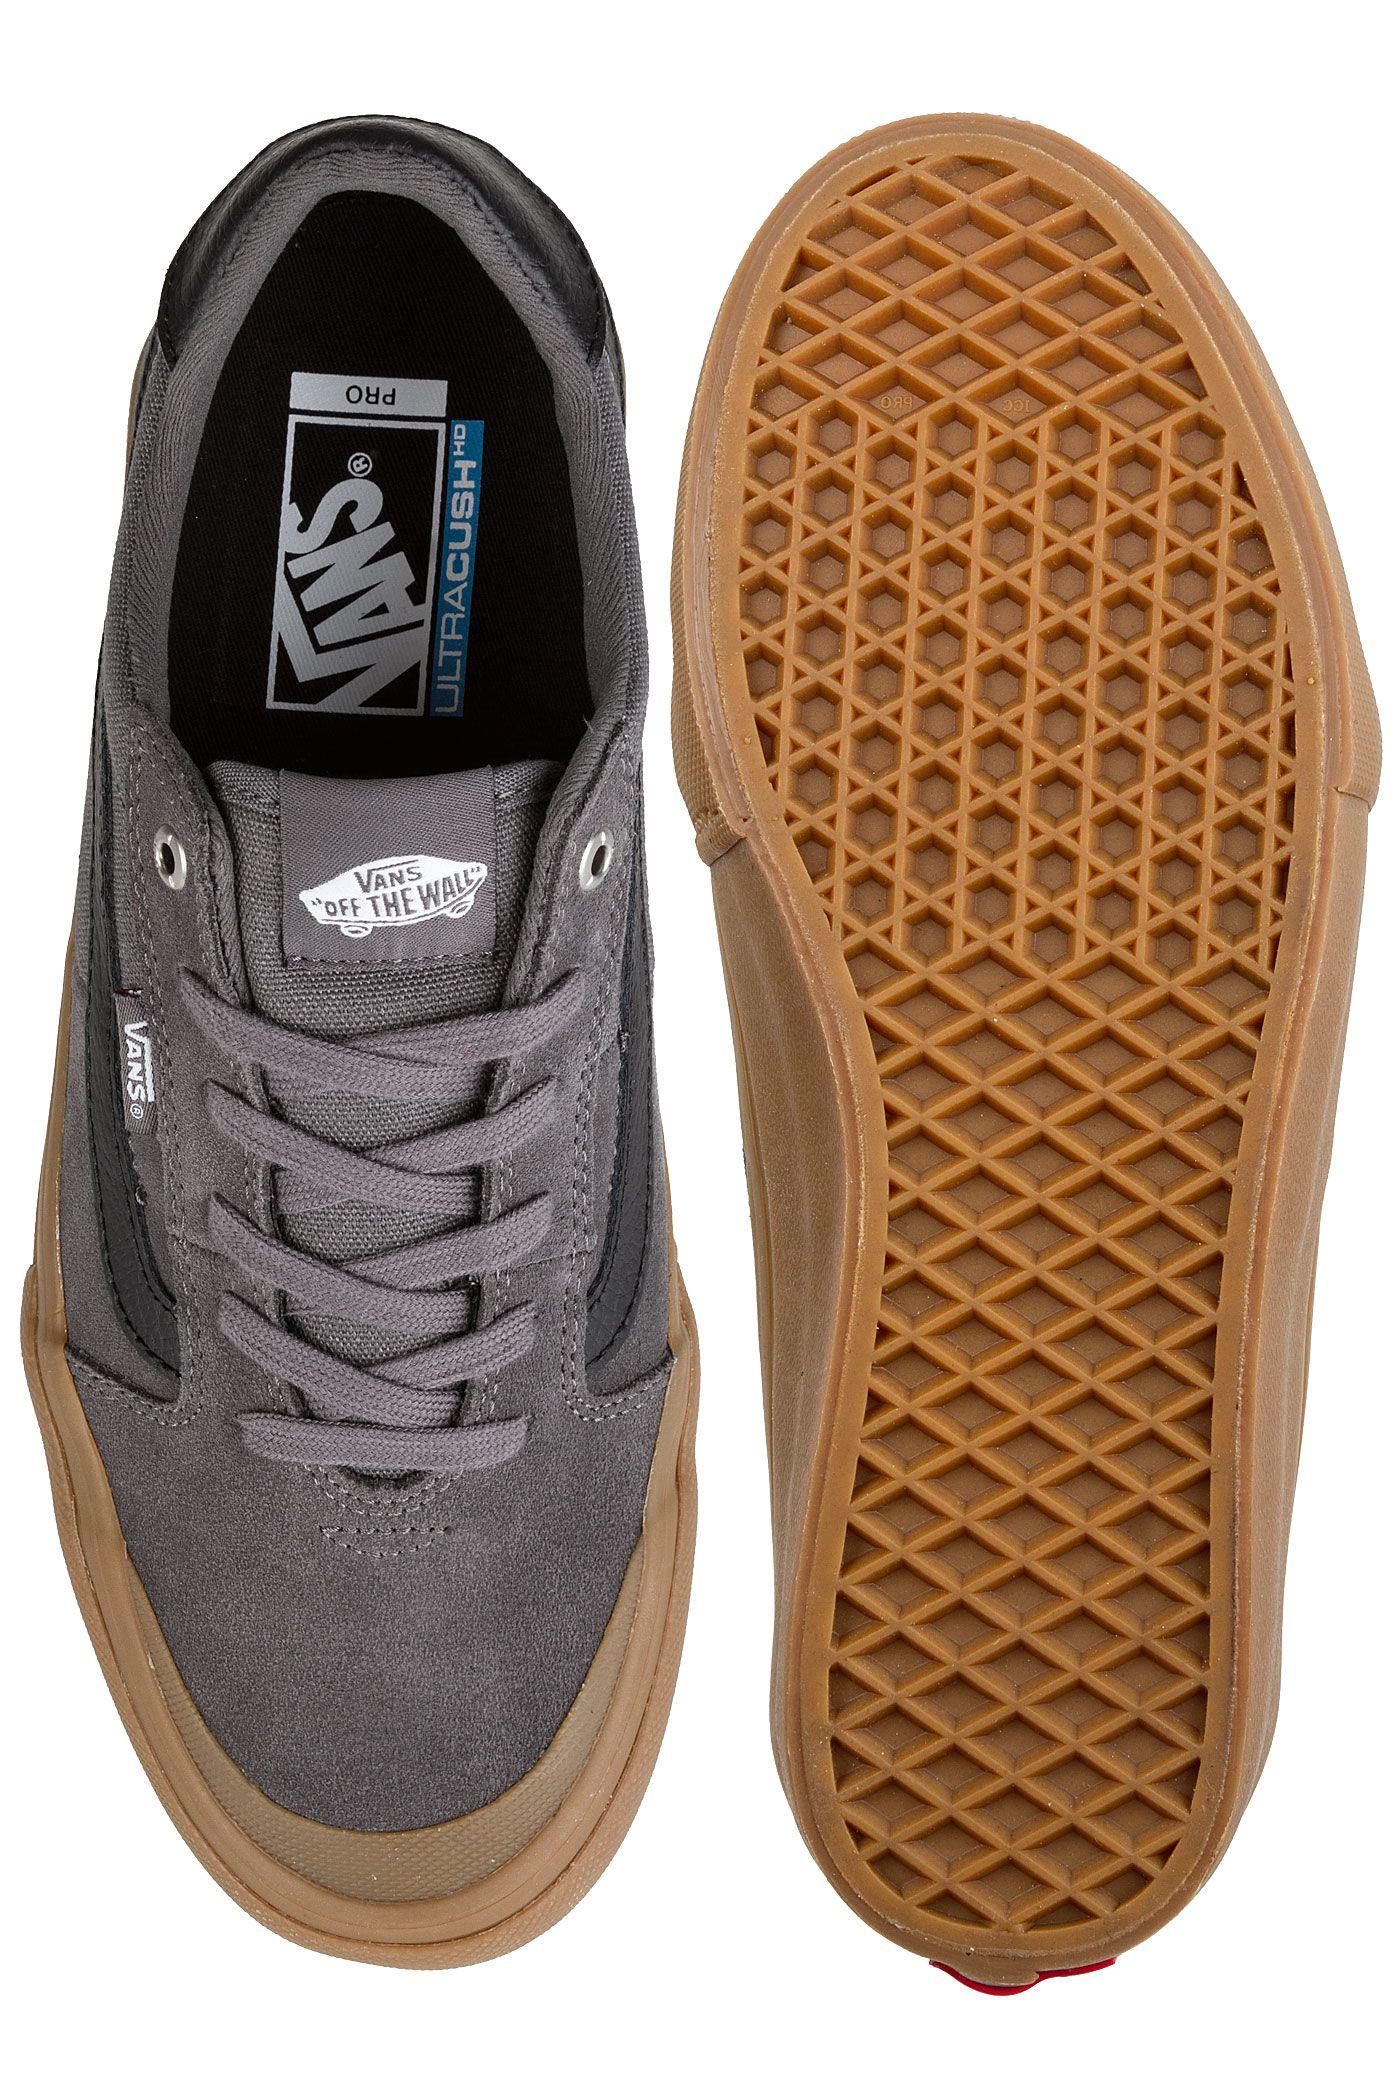 Vans Style 112 Pro Shoes (black white khaki) | Vans style